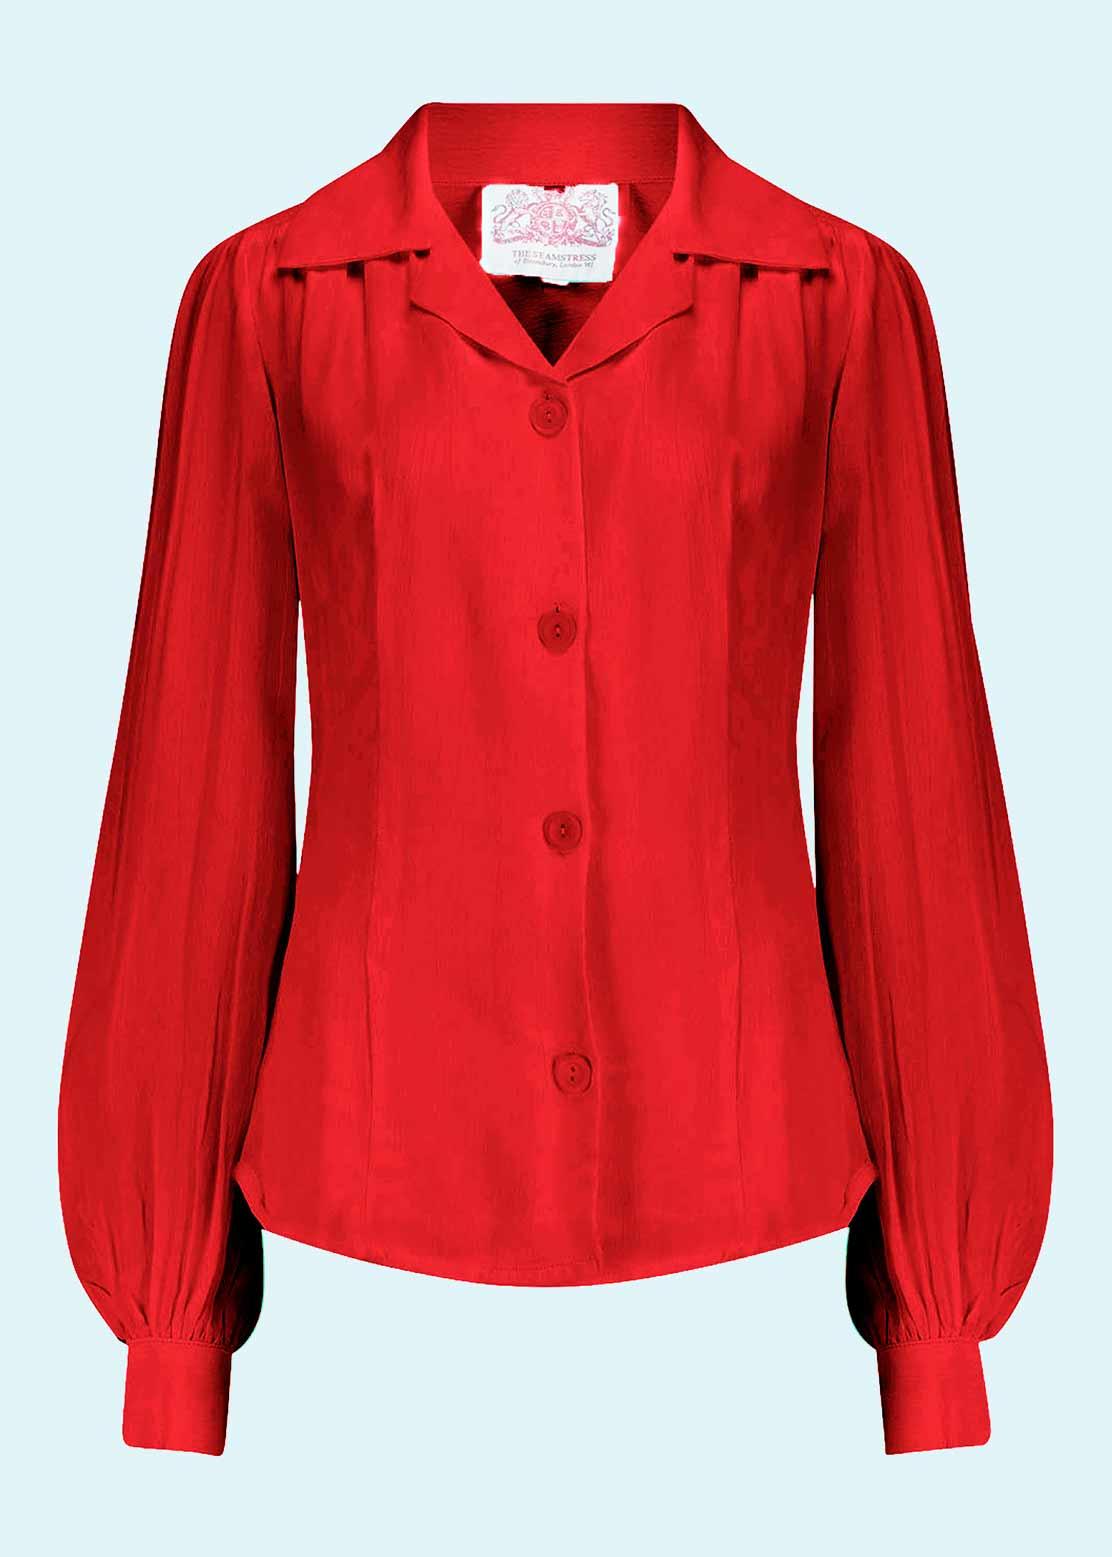 rød skjorte i vintage stil